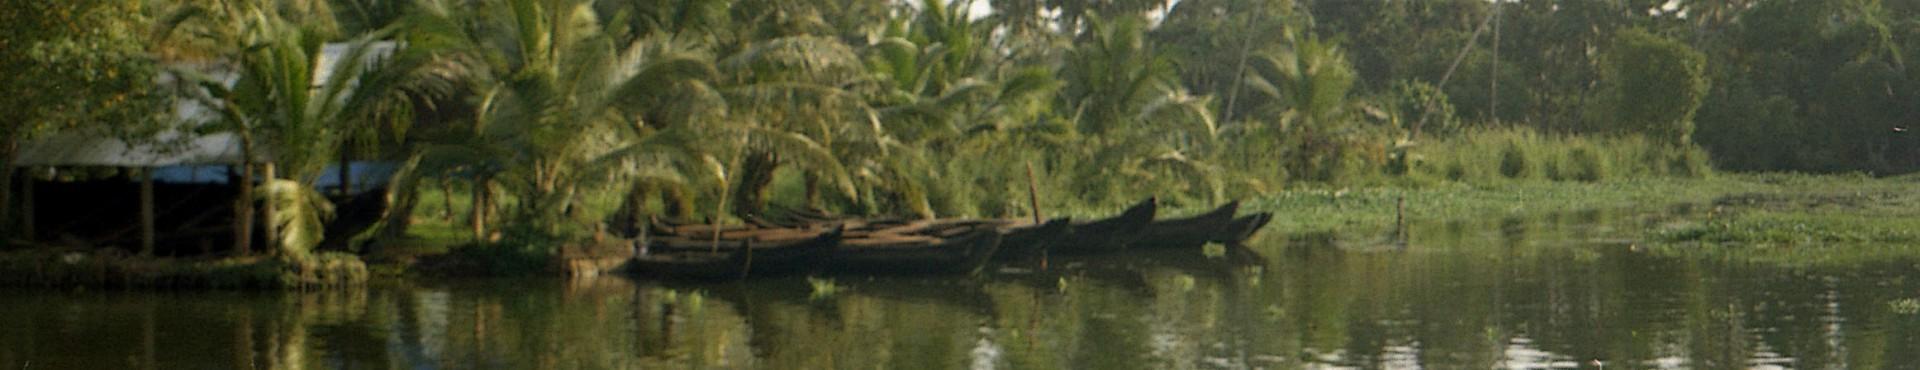 Kerala 2003 – Passaggio in India